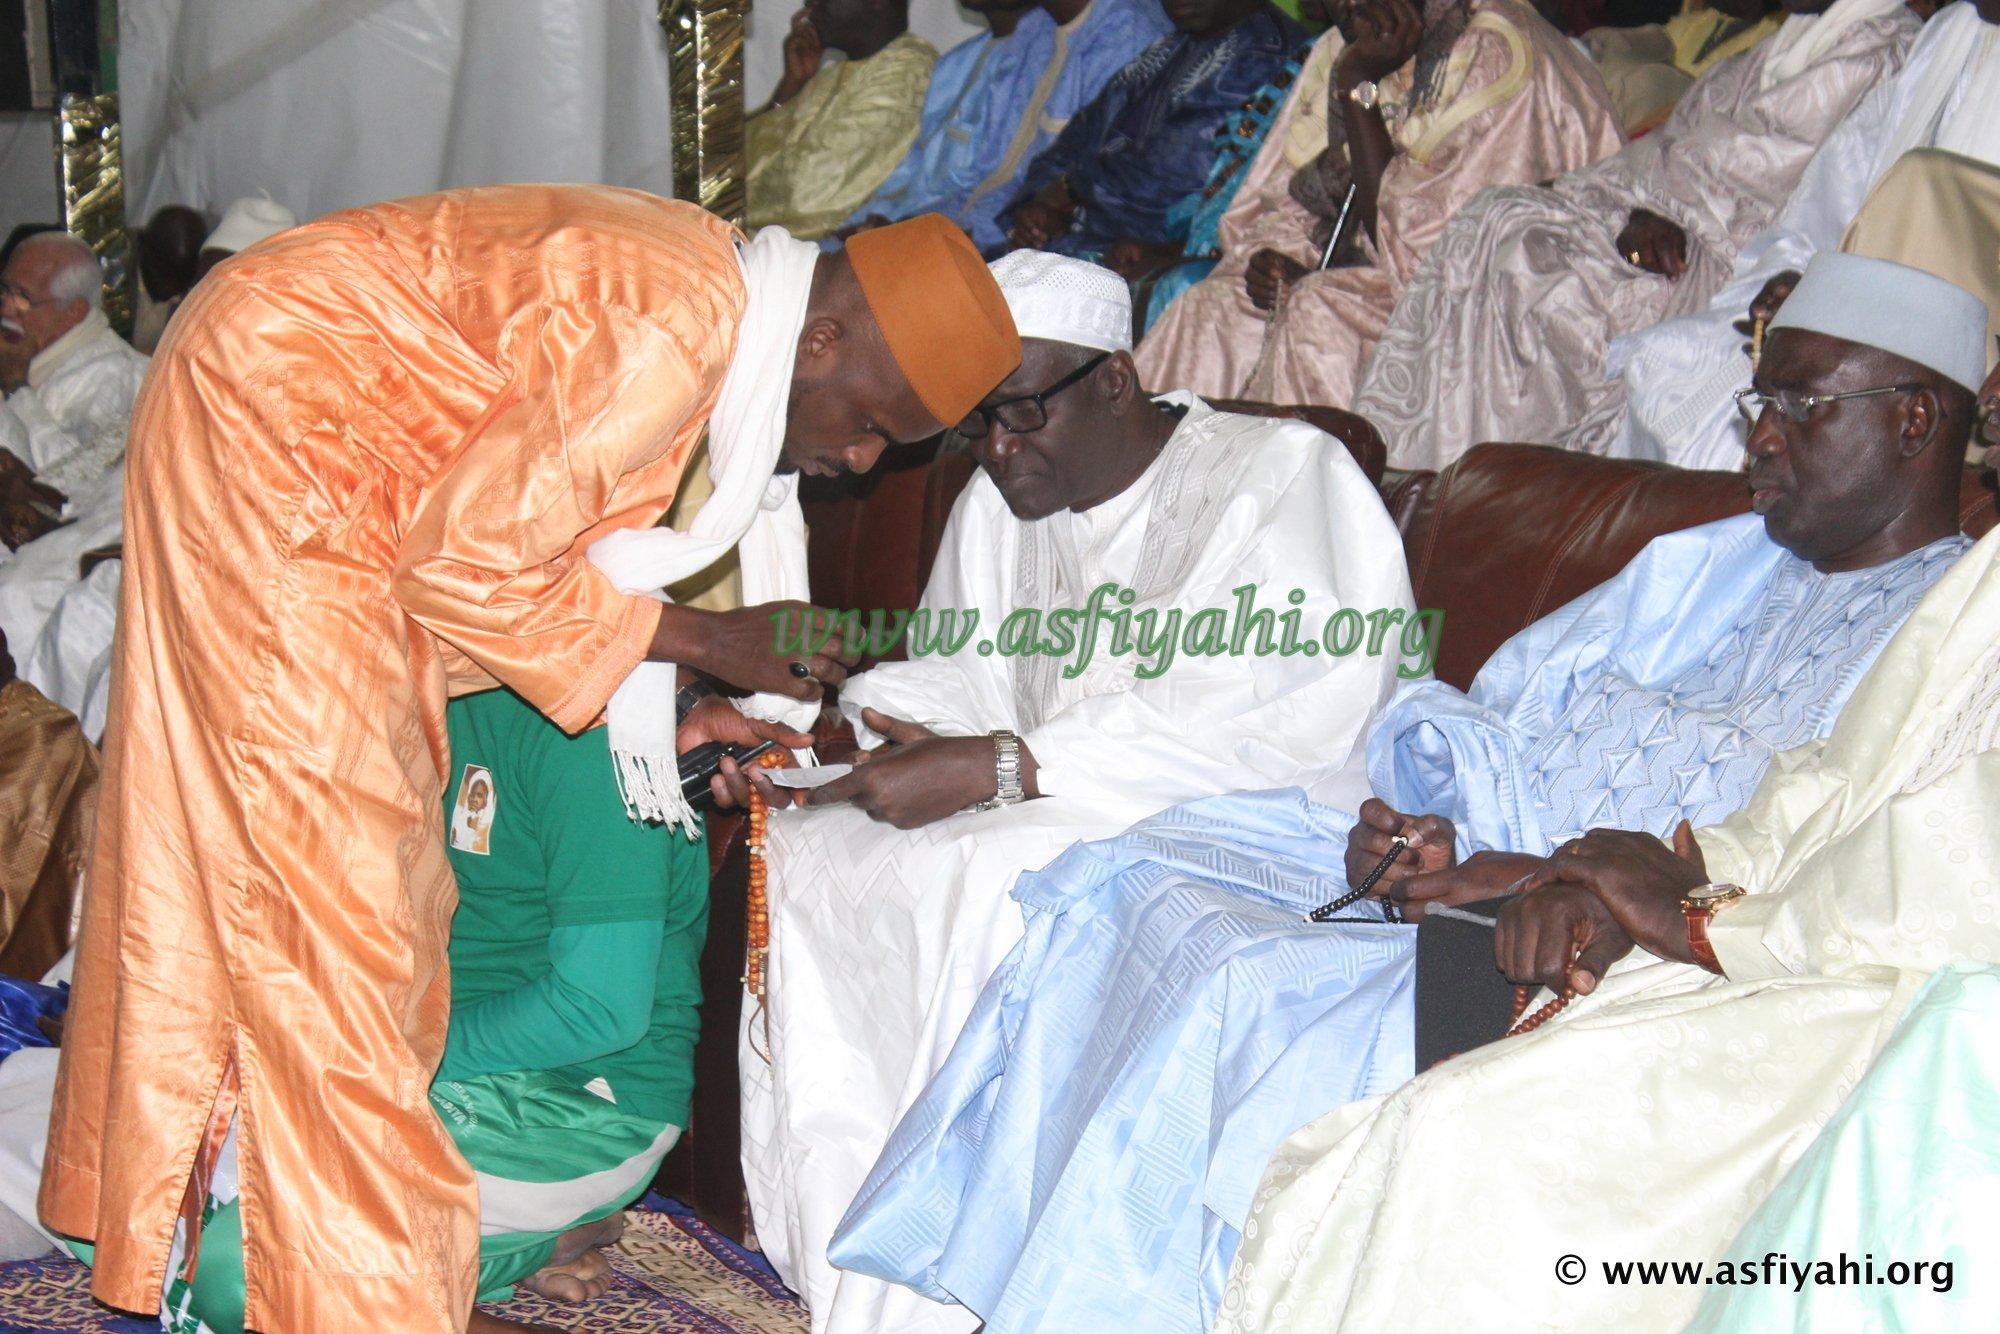 PHOTOS - Les Images du Gamou 2015 de la Zawiya El Hadj Malick Sy de Dakar